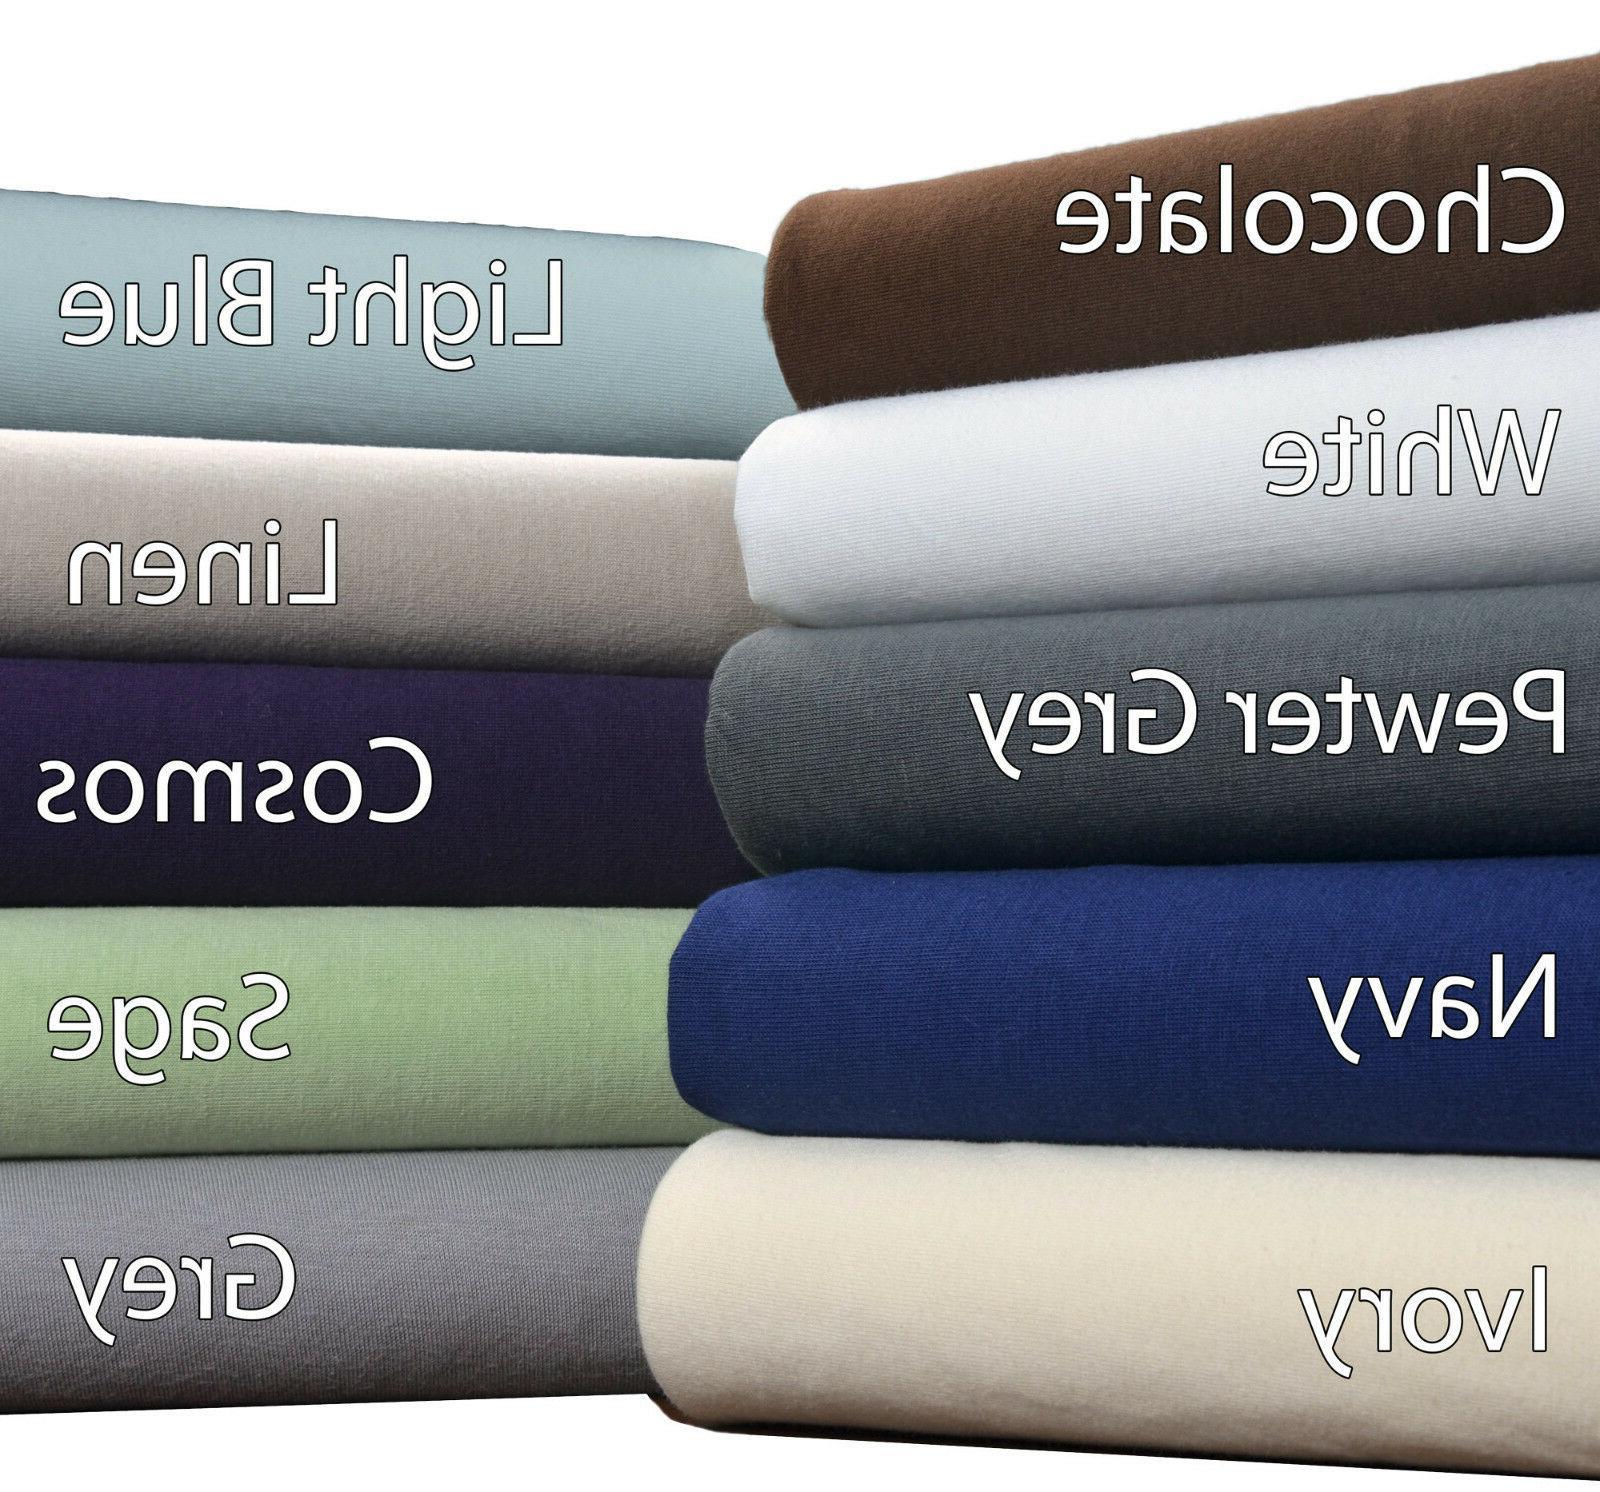 100 percent cotton jersey knit t shirt